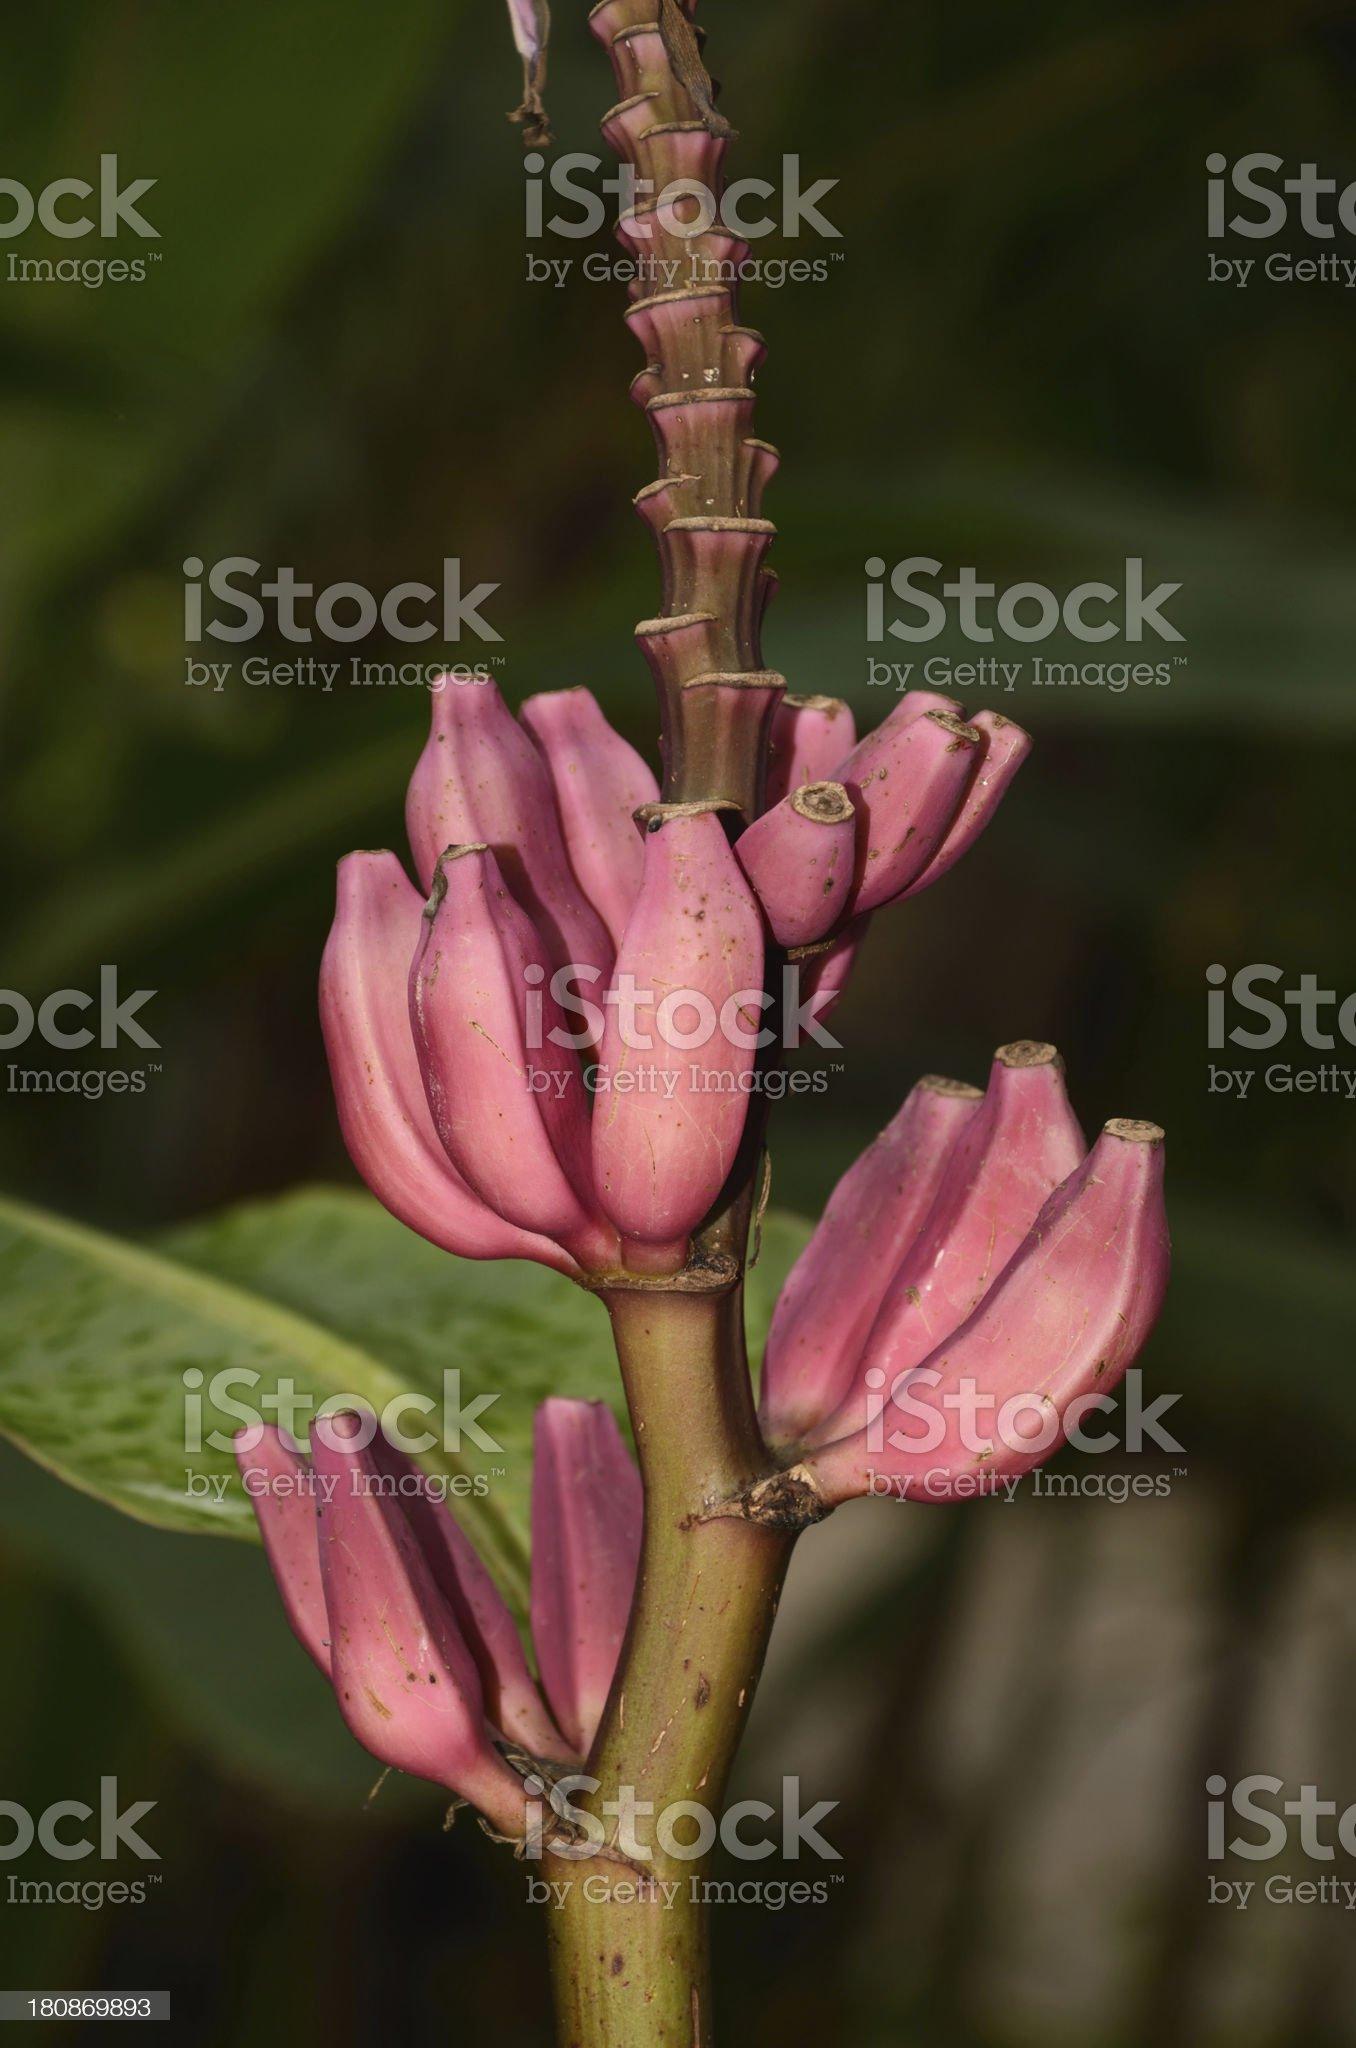 Banana branch royalty-free stock photo